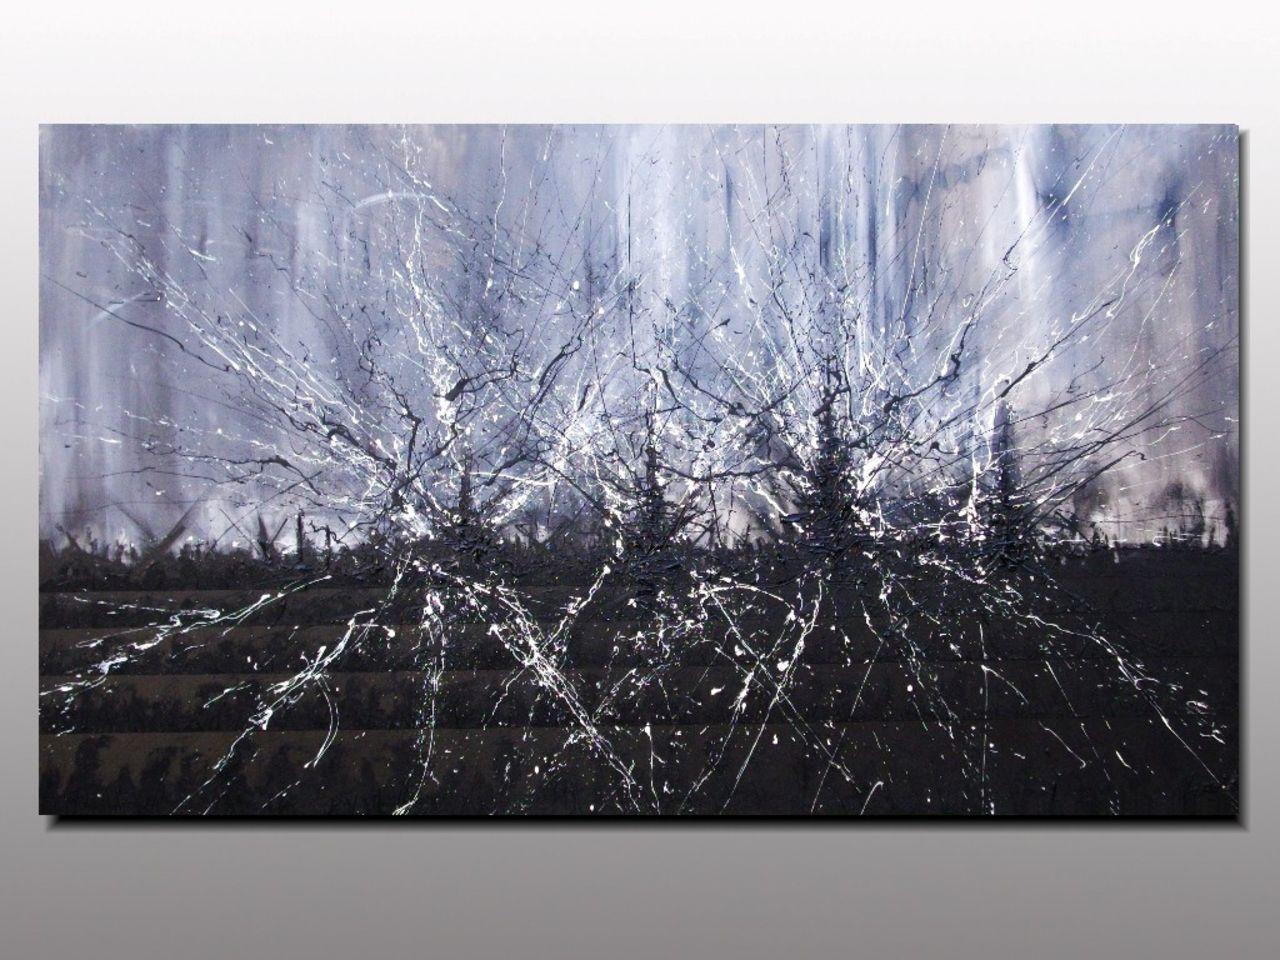 MK  Lepolsk Matuszewski IDYLLIC DISASTER  expressionnisme abstrait  action painting dripping tubbing relief artiste peintre plasticien Lepolsk Matuszews